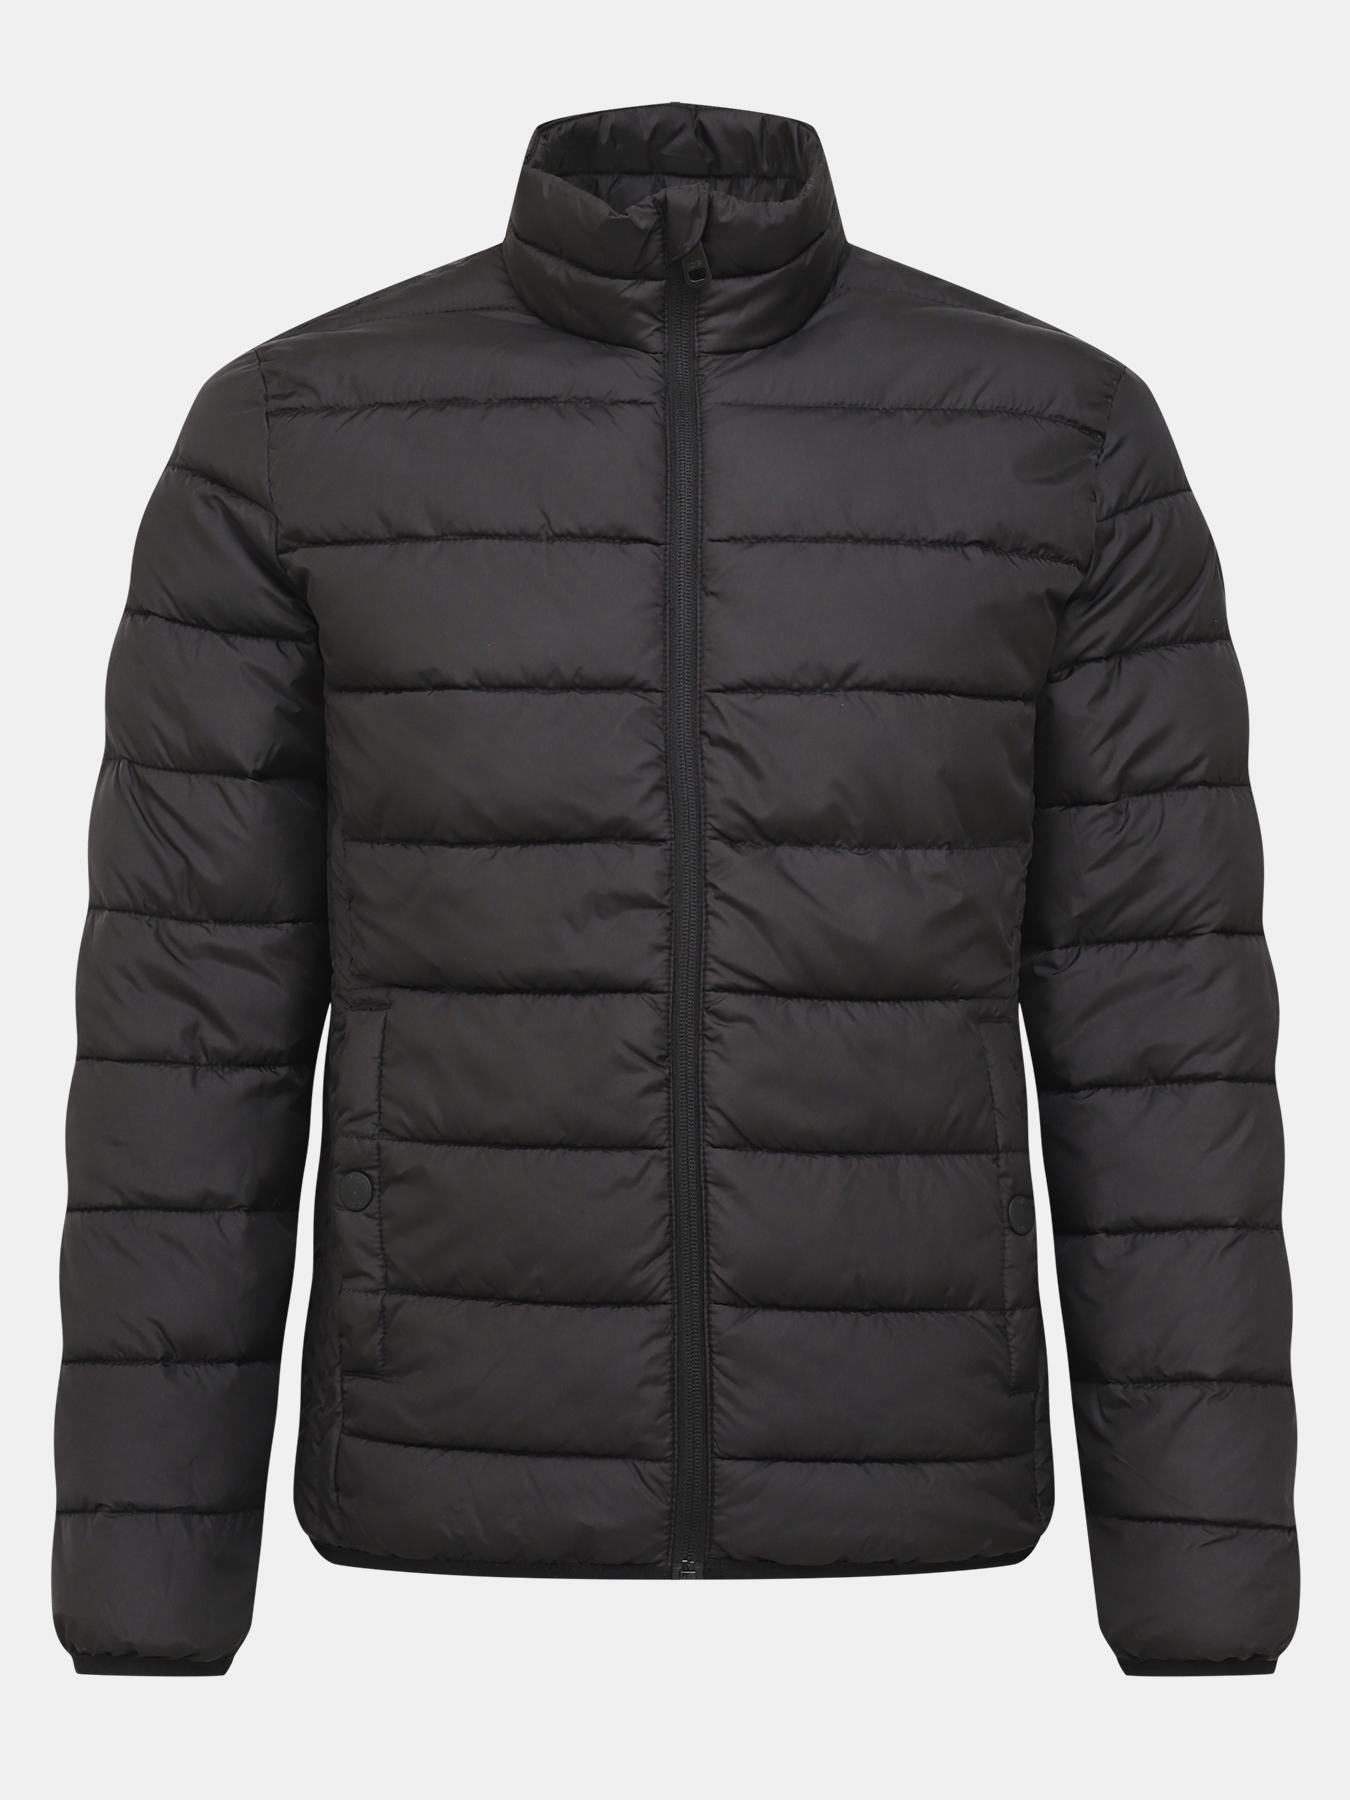 Фото - Куртки QS designed by Куртка bf designed by beatriz furest туфли